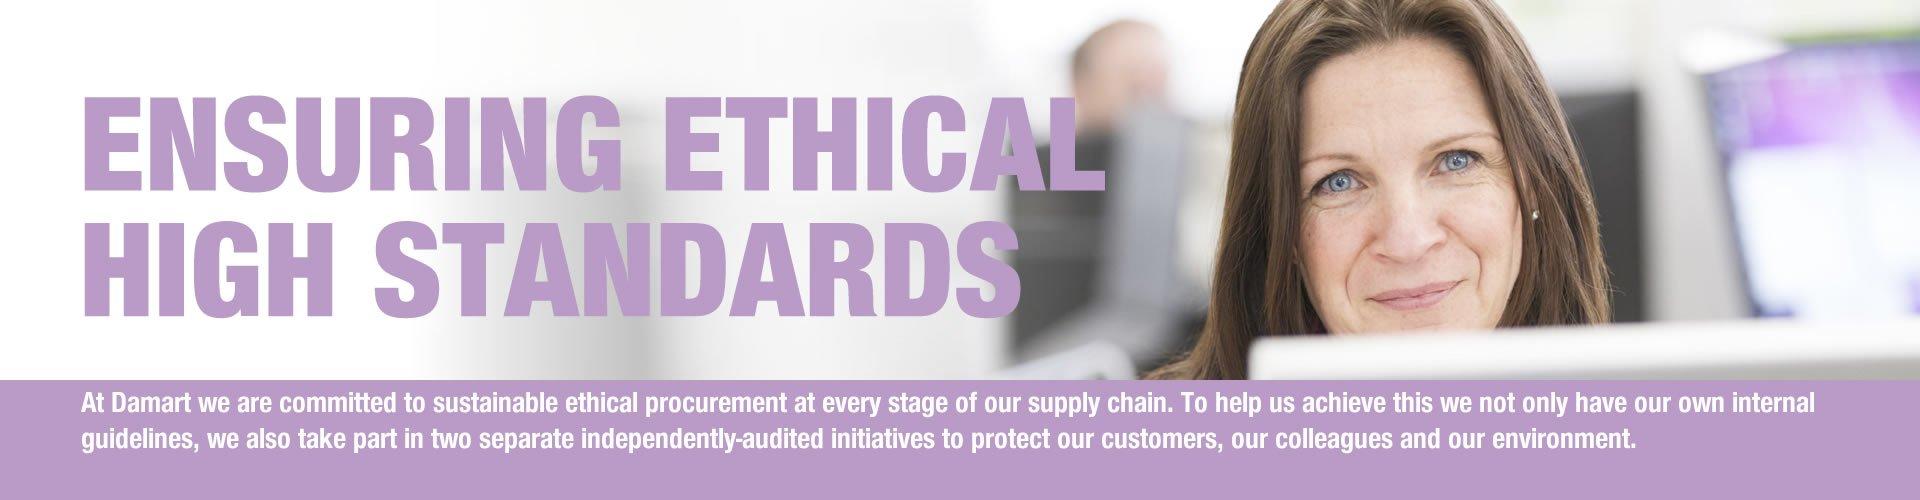 Damart Ensuring Ethical High Standards